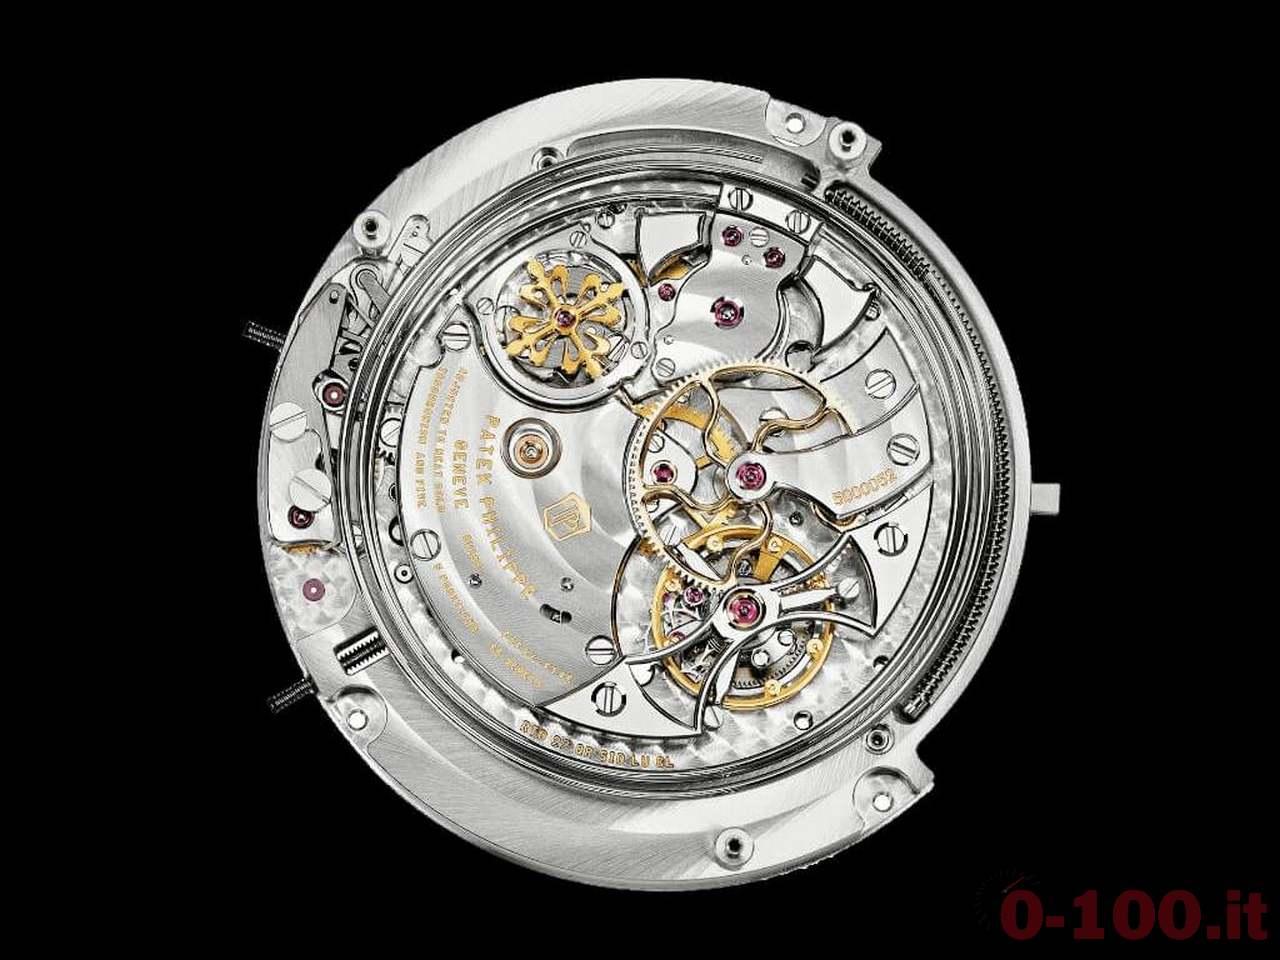 only-watch-2015-il-patek-philippe-5016a-prezzo-price_0-1003